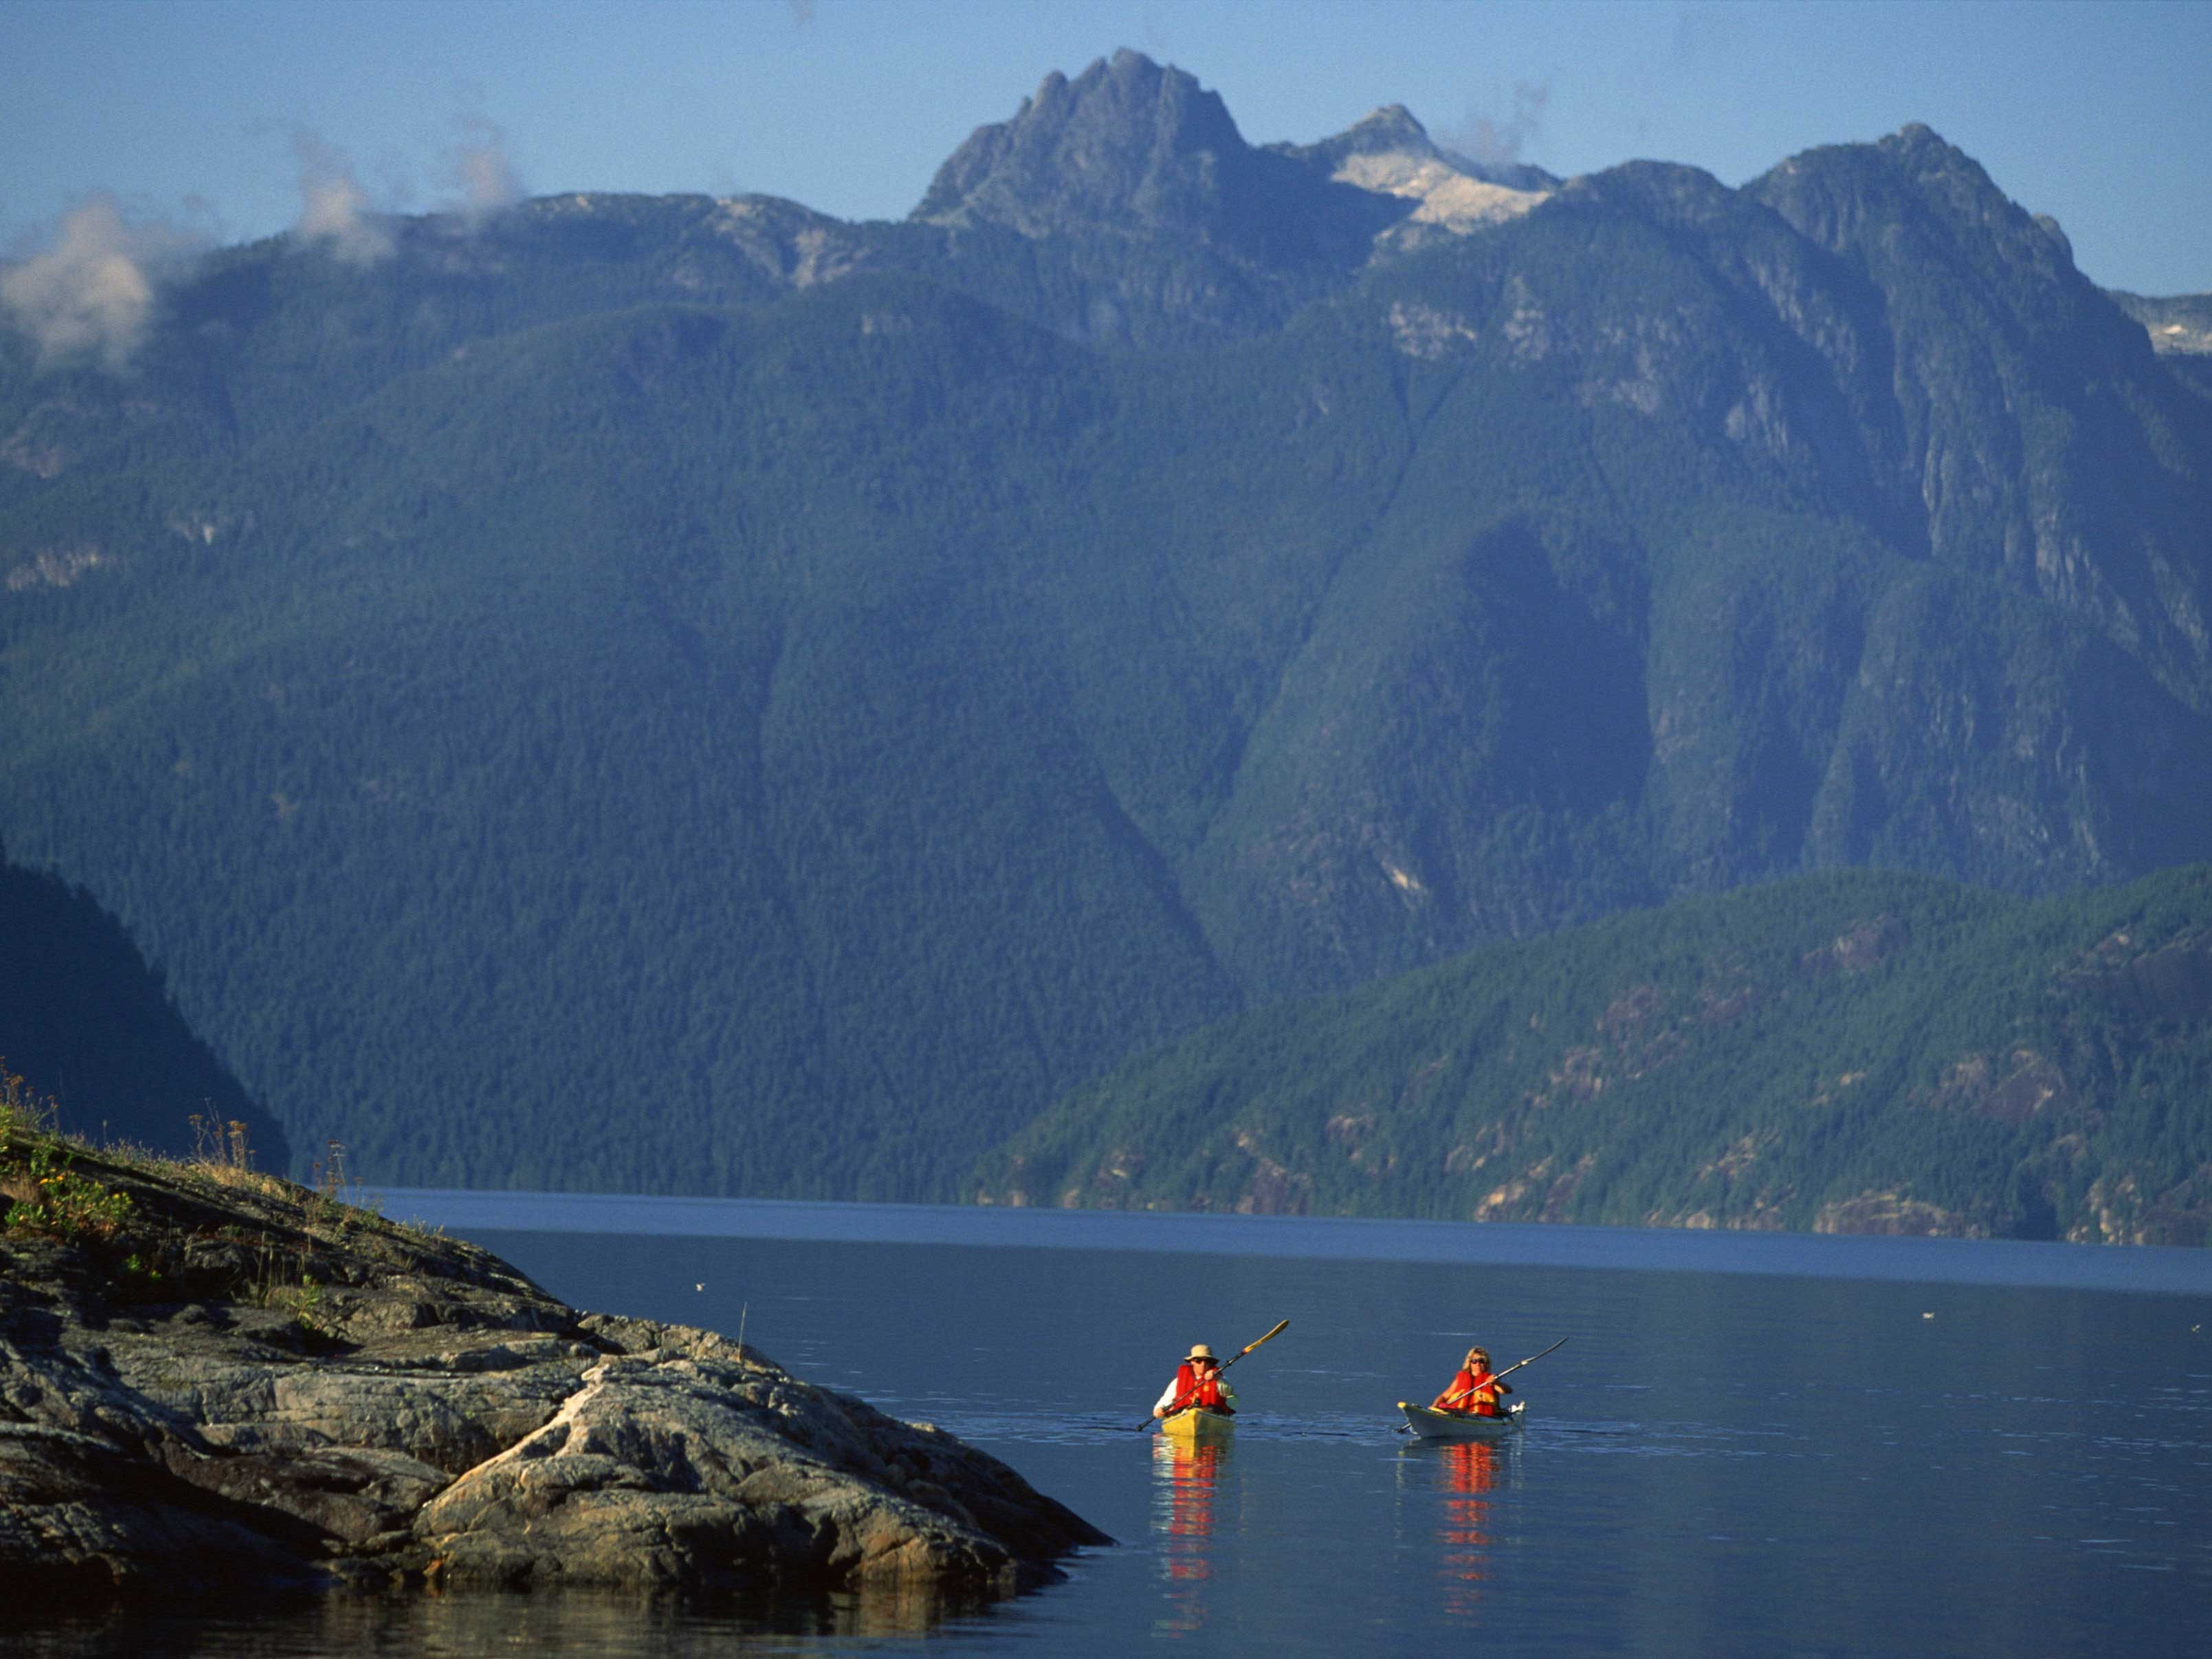 First Nations Interpretive Paddle - Sunshine Coast, B.C.